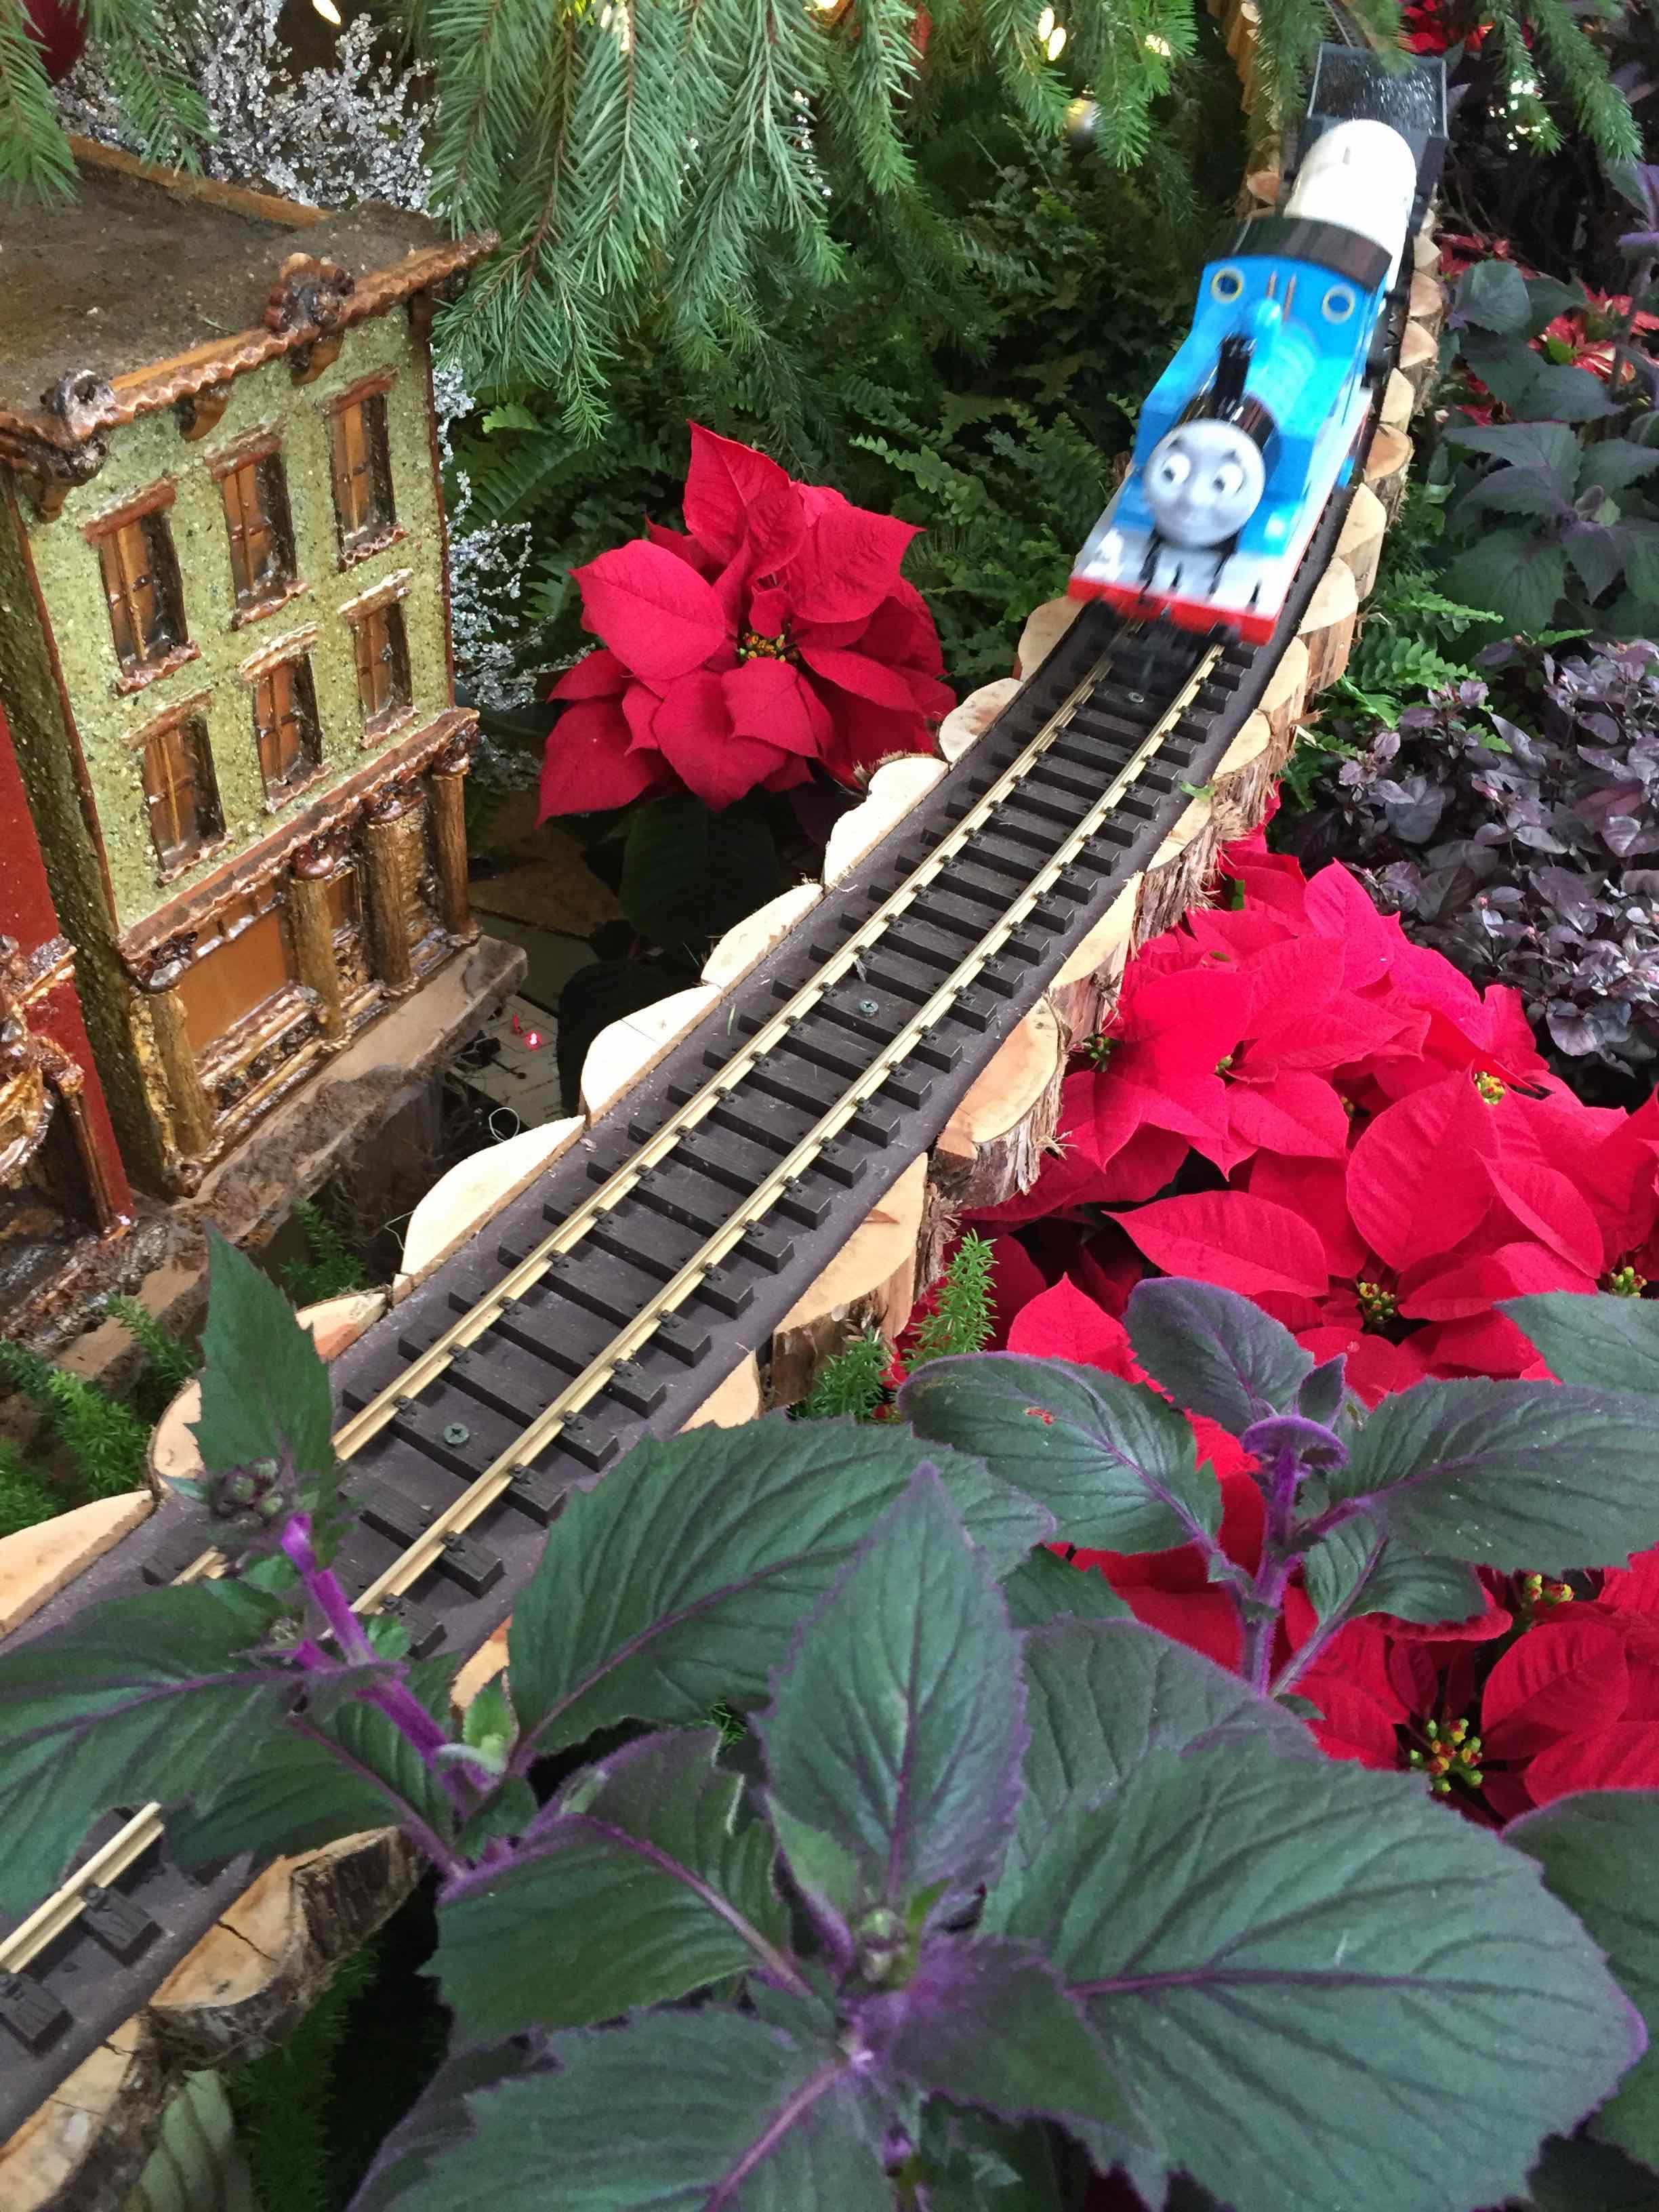 Thomas the train at Botanical Gardens